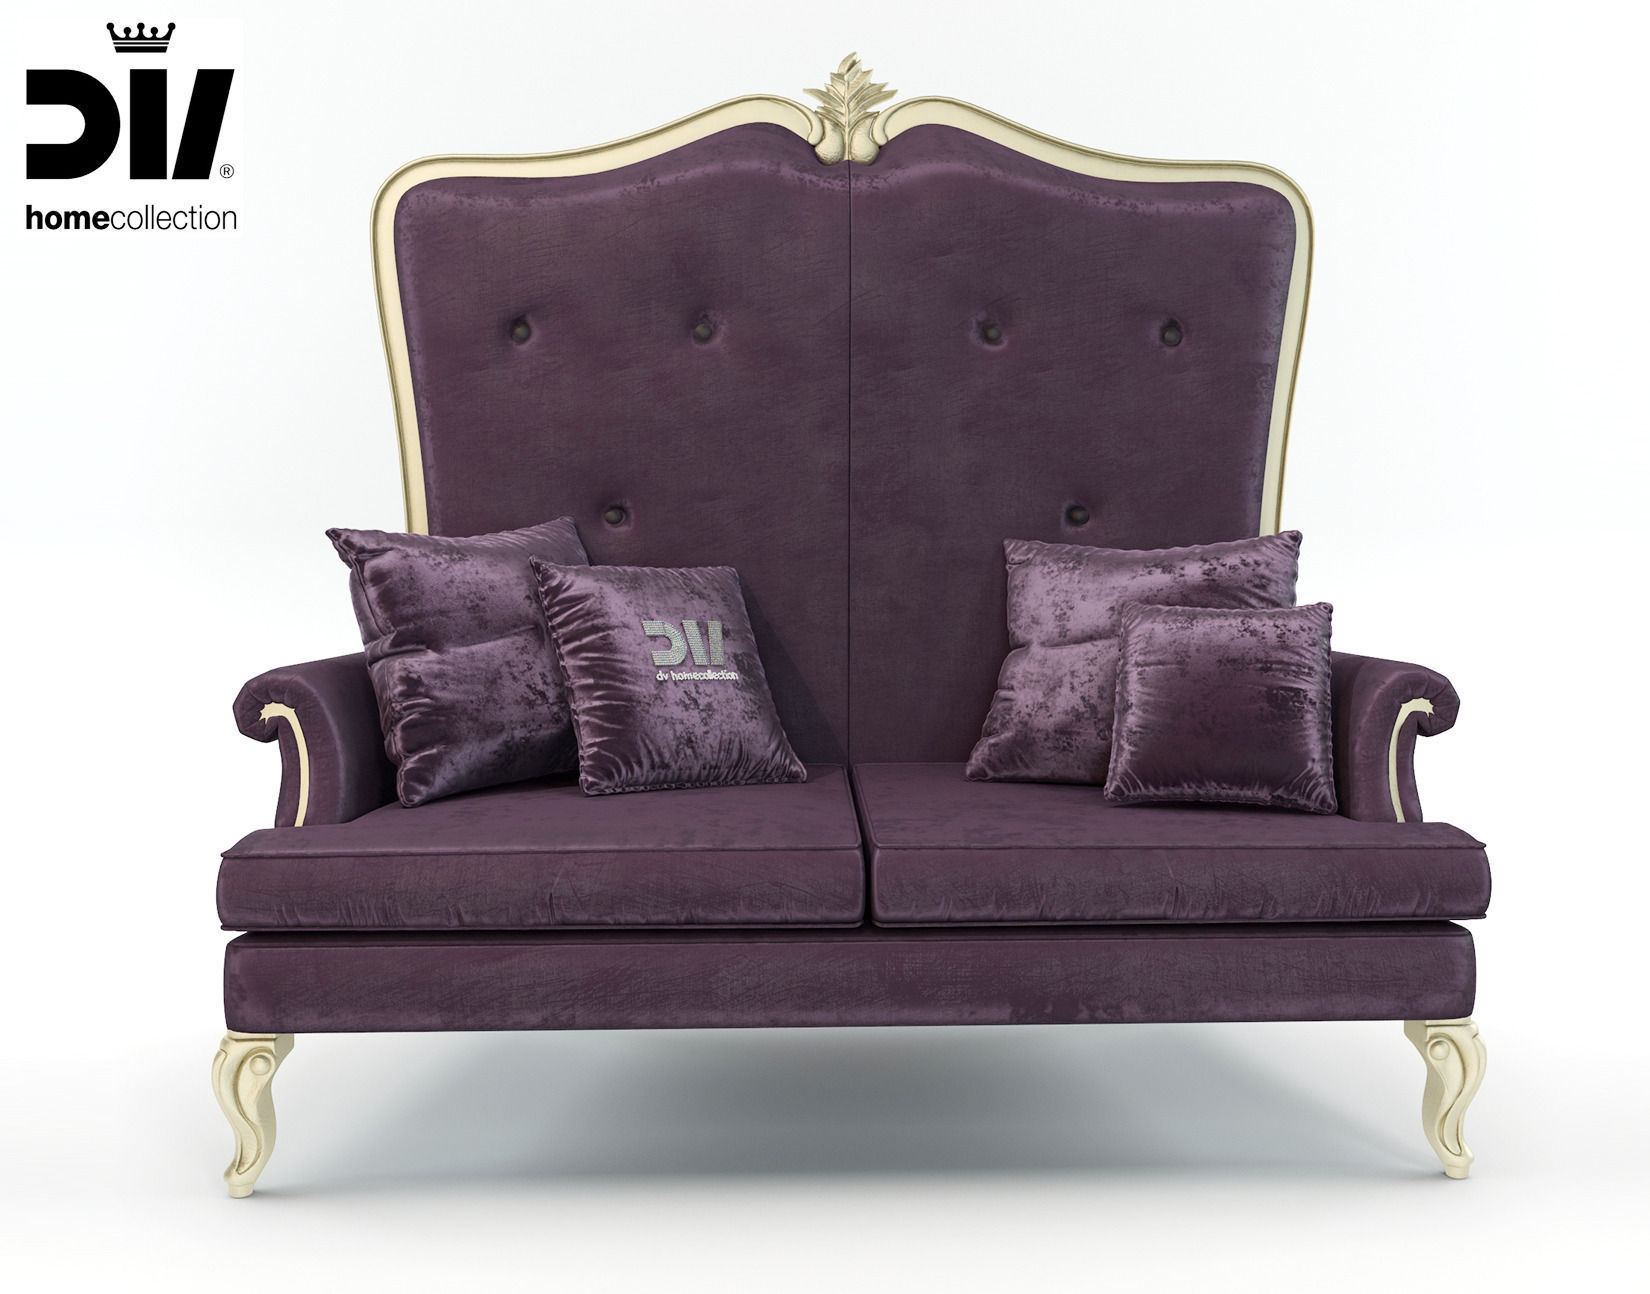 high back classic elegant sofa by dv home collection 3d. Black Bedroom Furniture Sets. Home Design Ideas